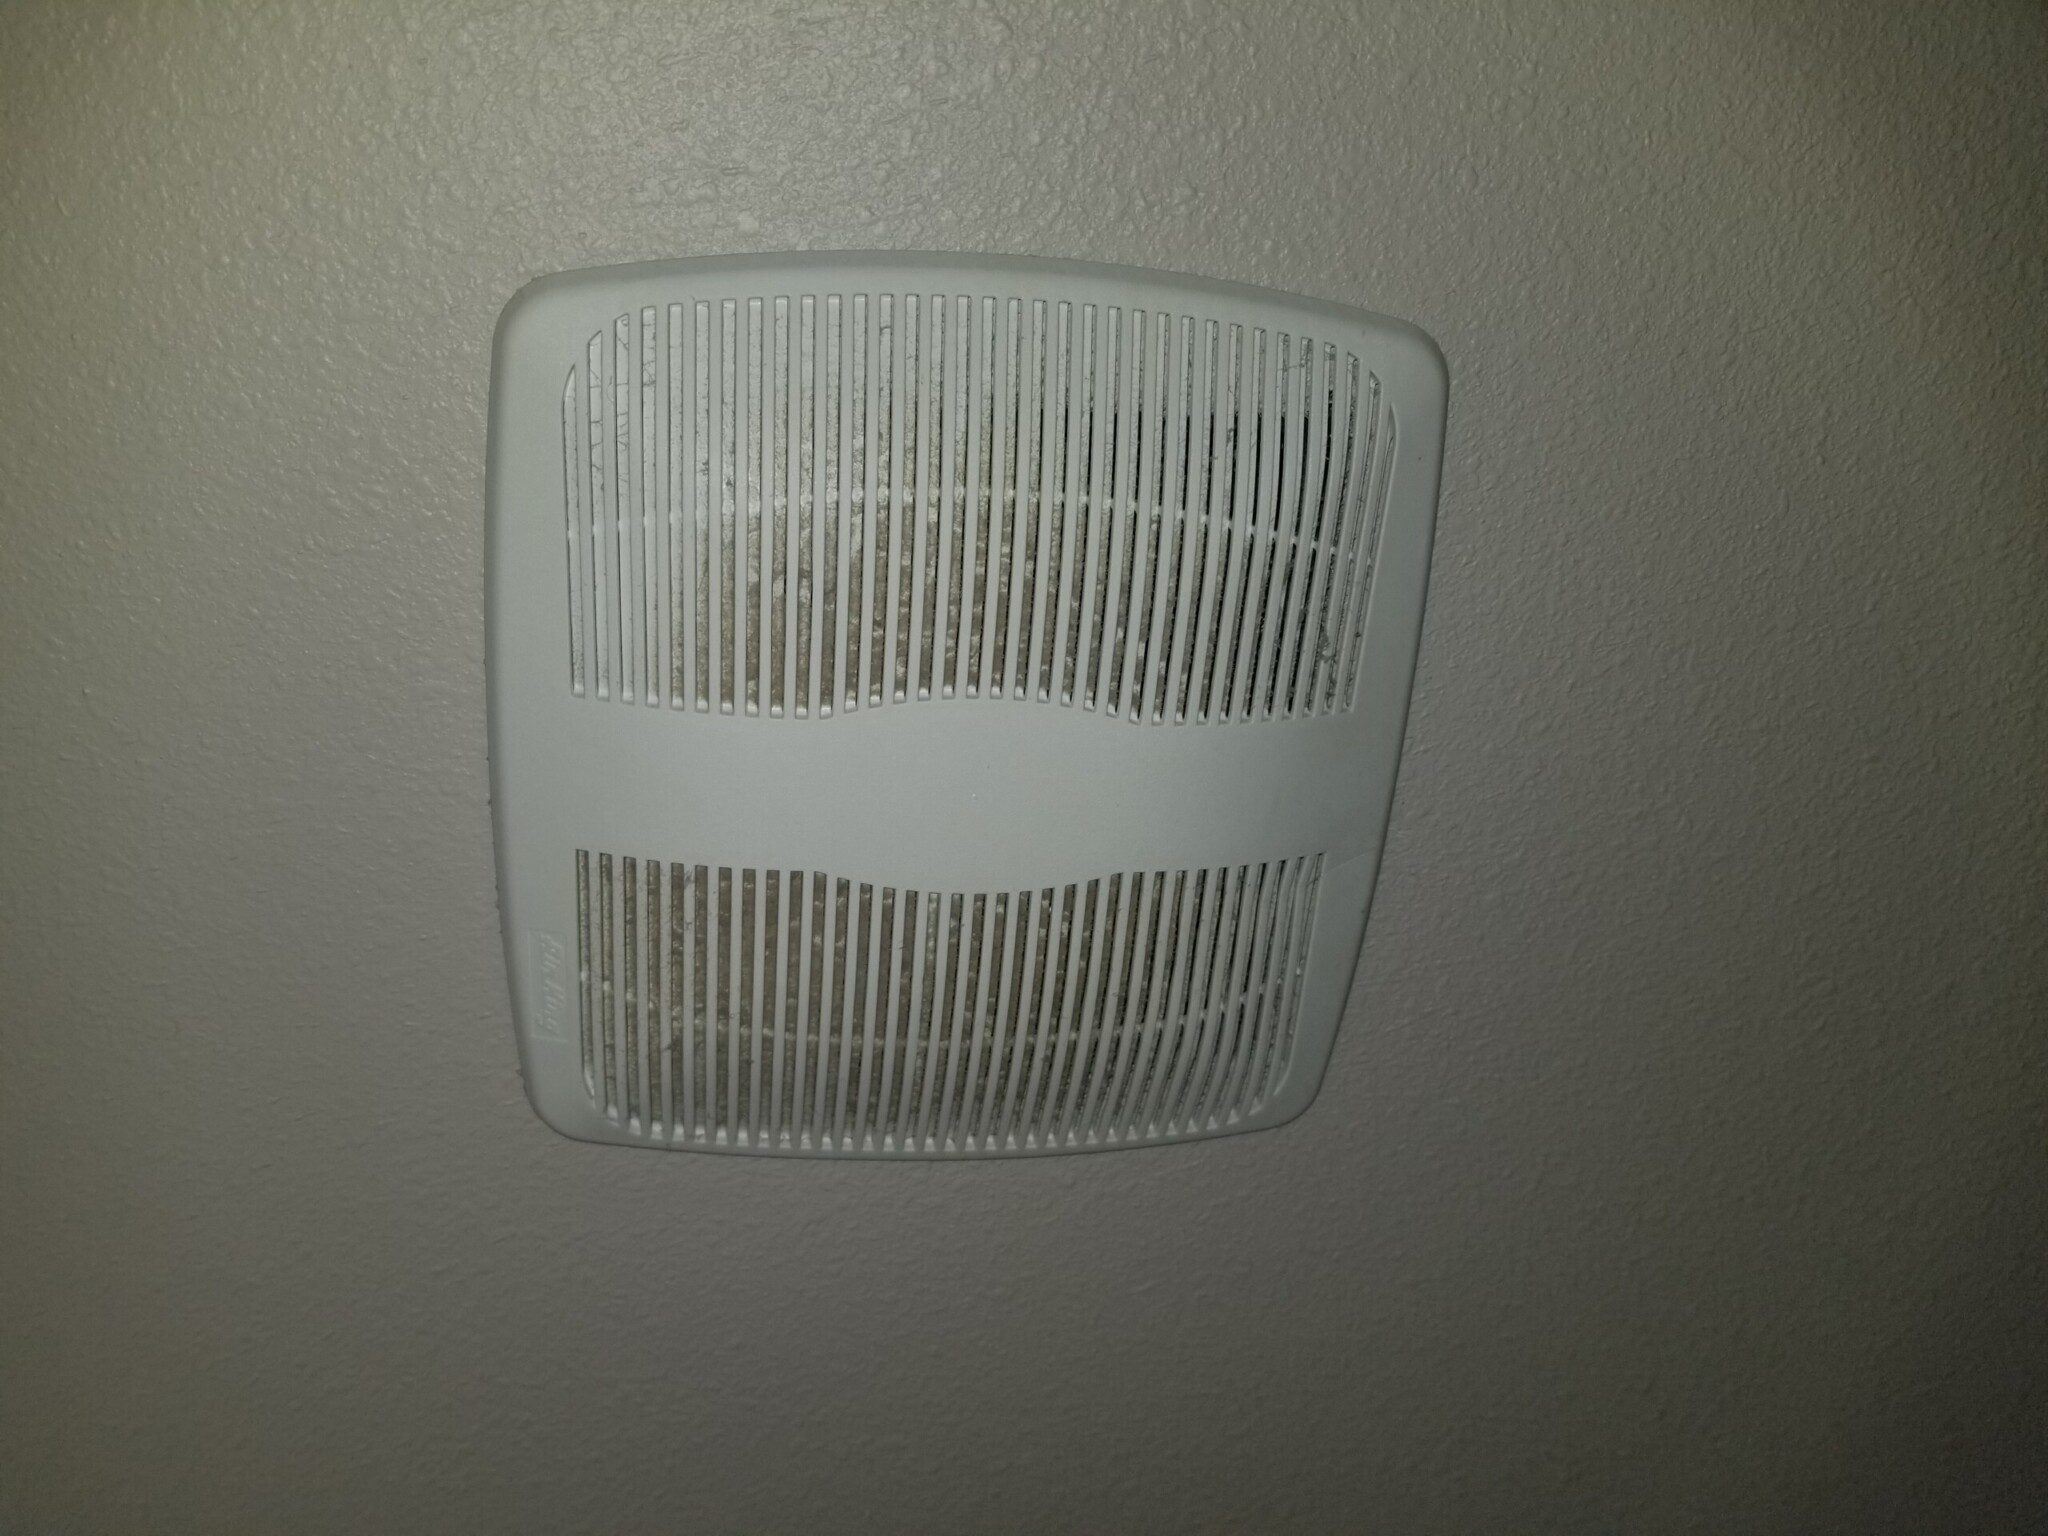 Maintain bathroom fan